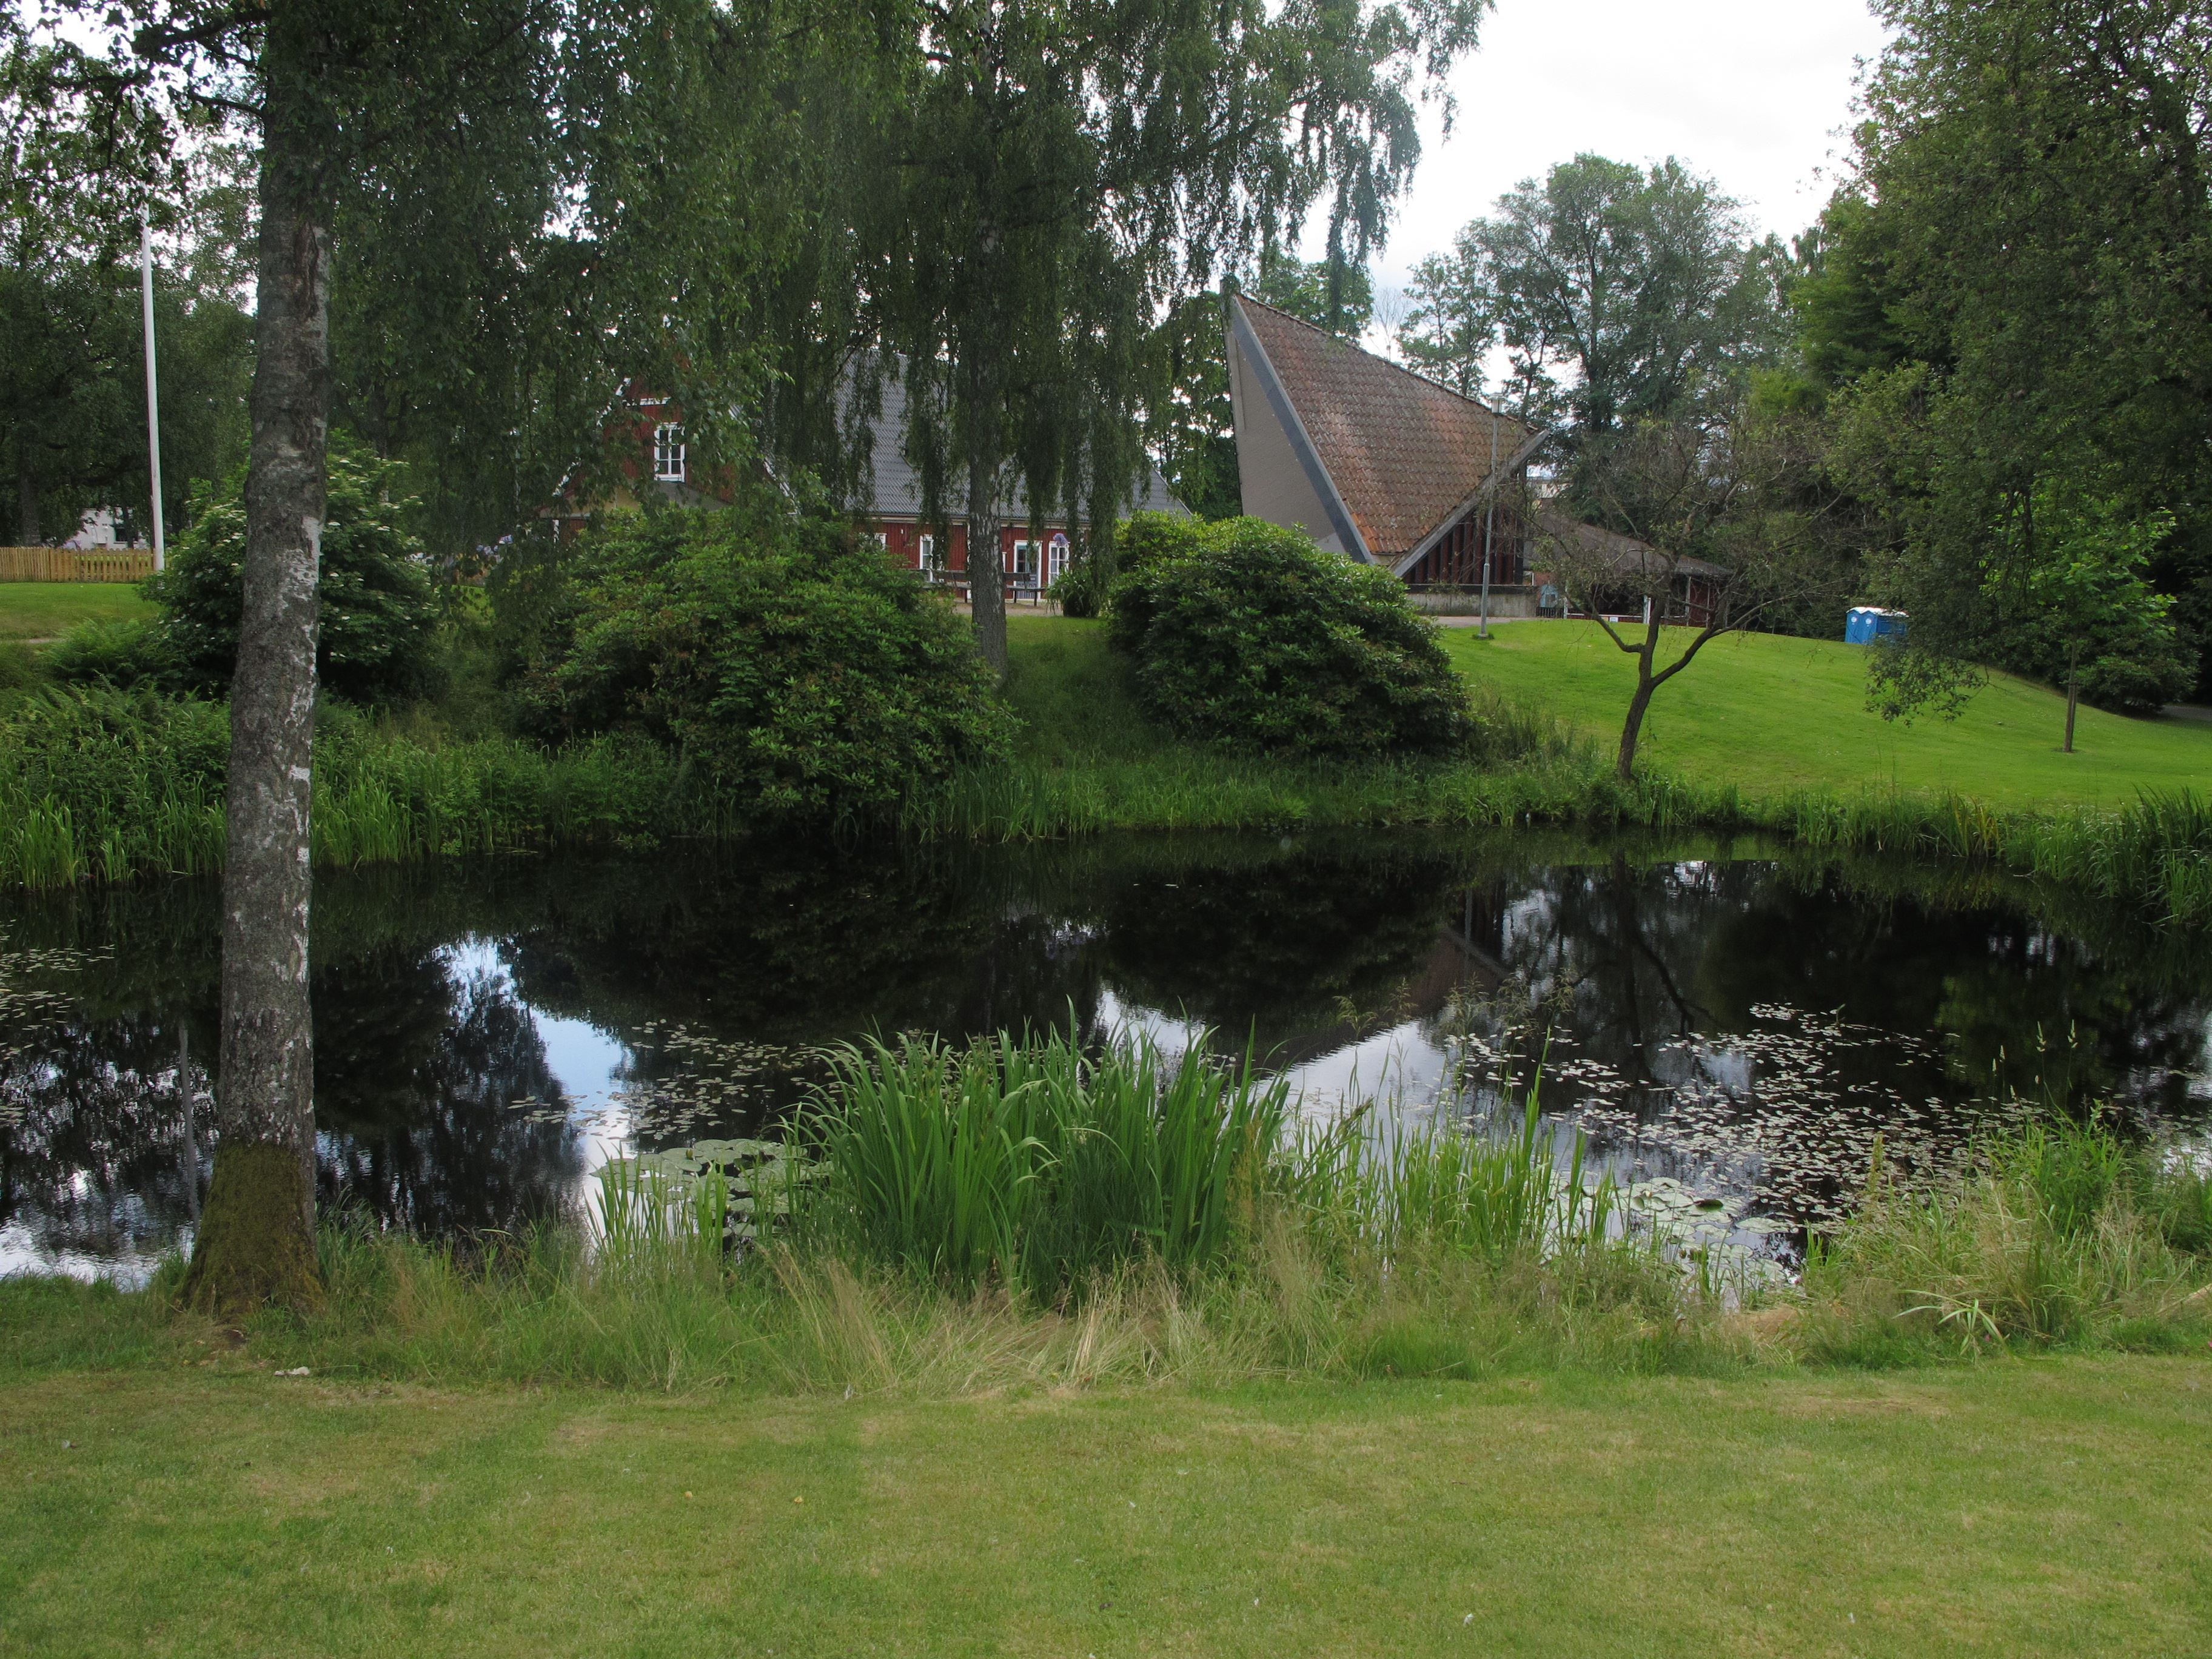 Sommeryoga in Ljungbys Hembygdspark